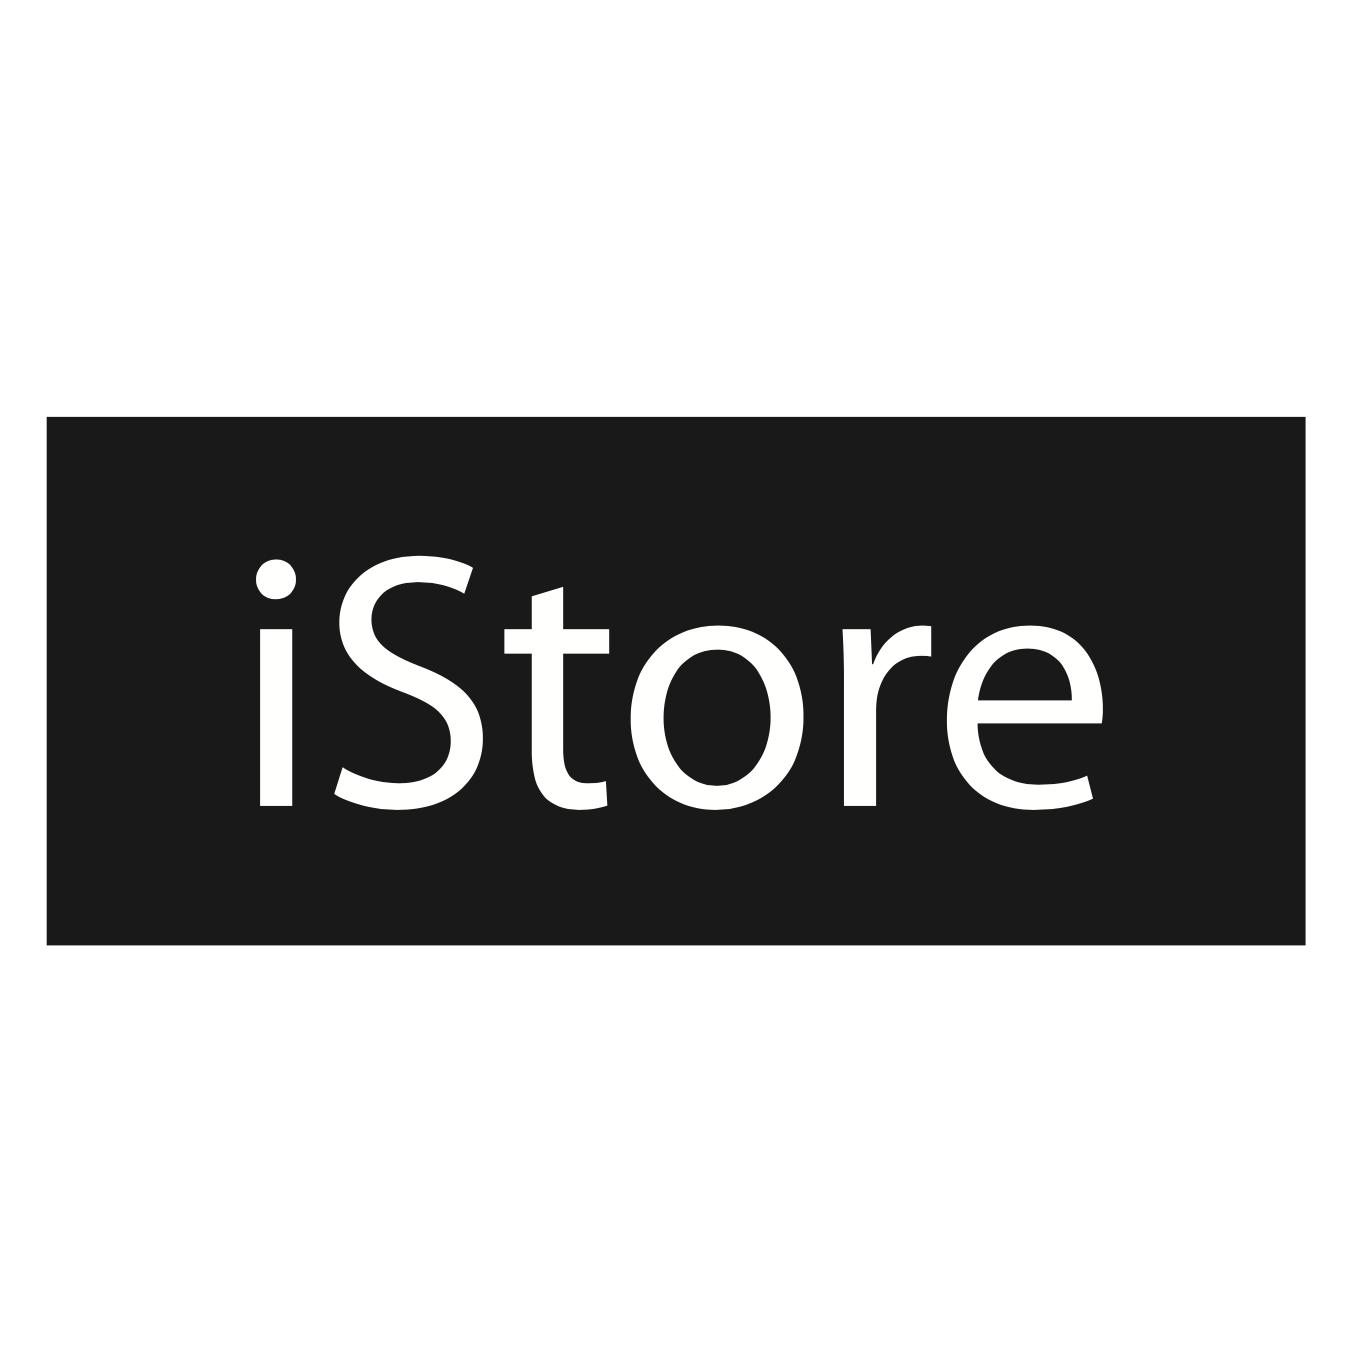 MacBook Pro Ultimate 5K Bundle